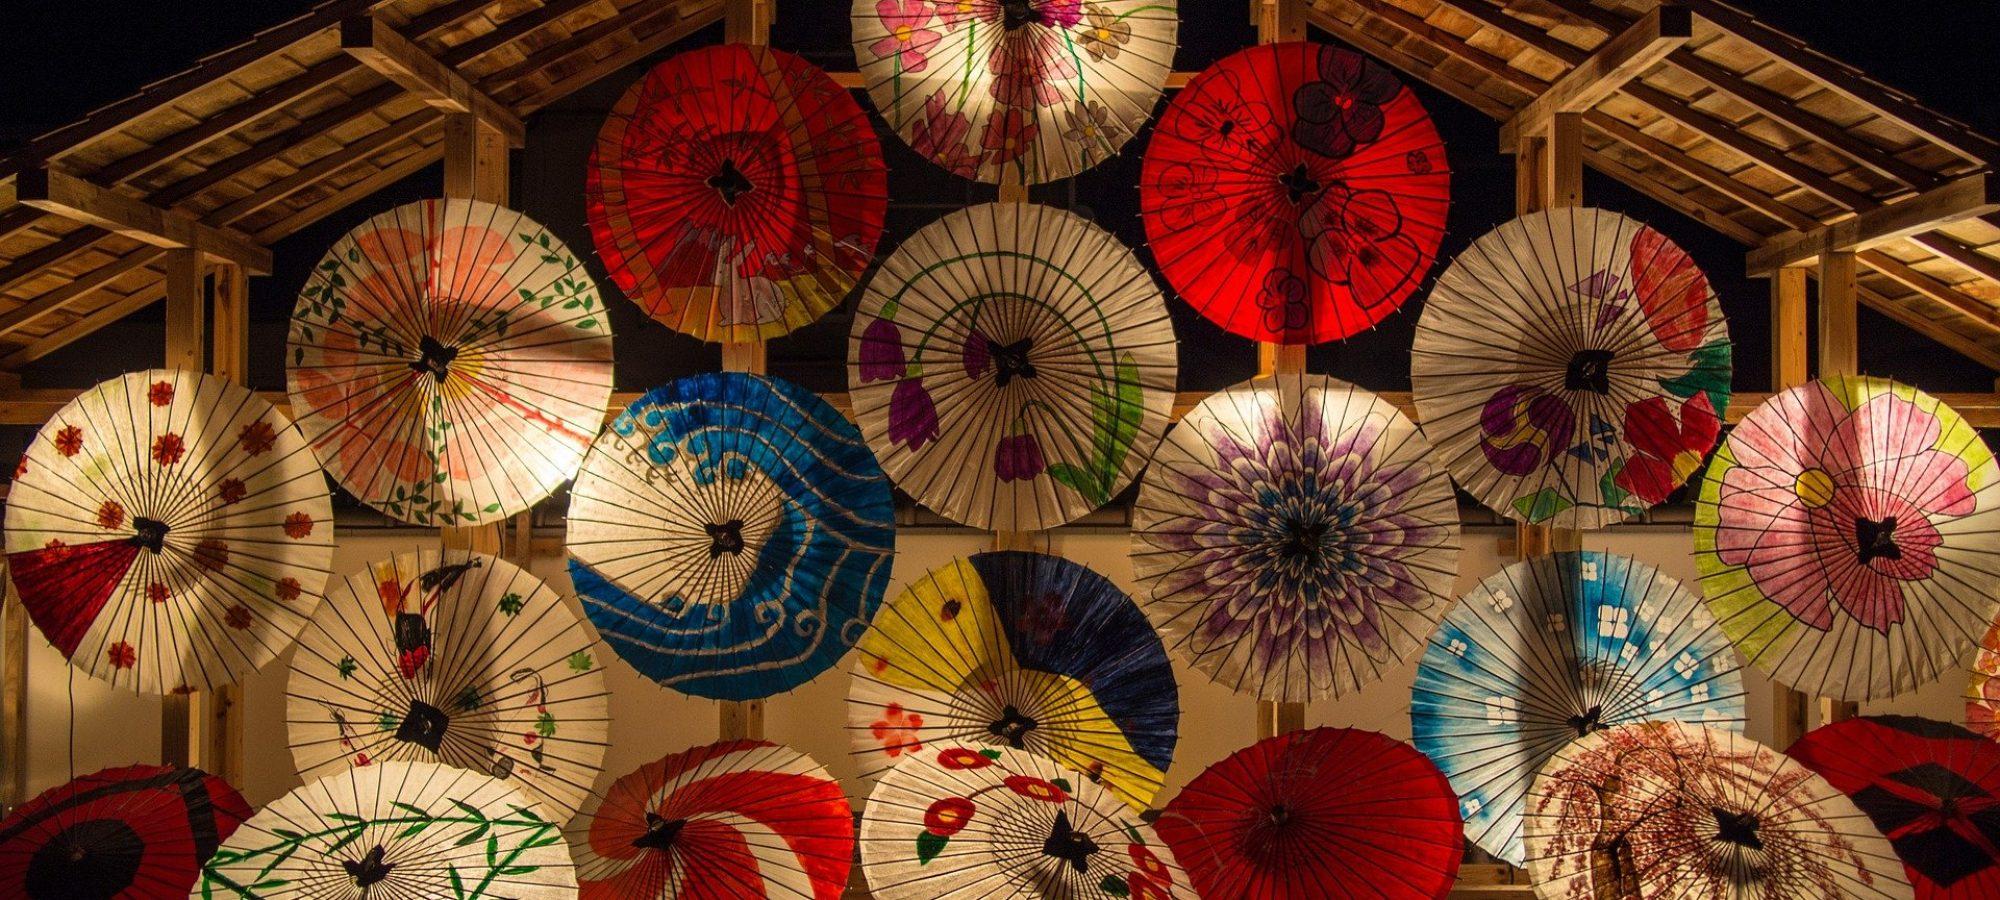 japanese-umbrellas-636870_1920